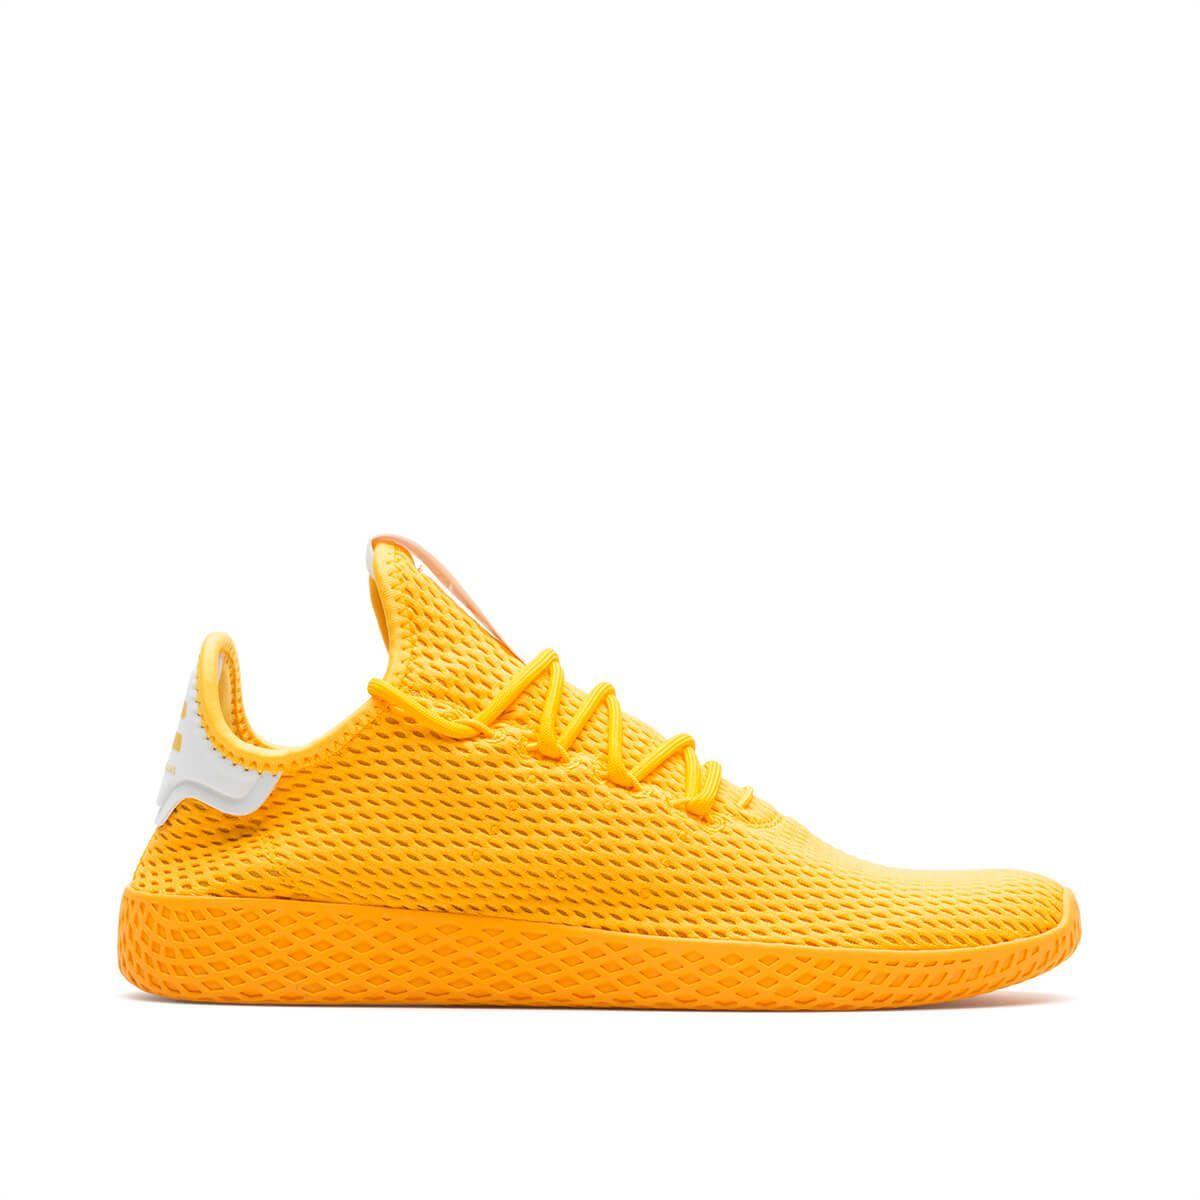 Adidasoriginals zapatos adidas tenis Adidas Originals PW